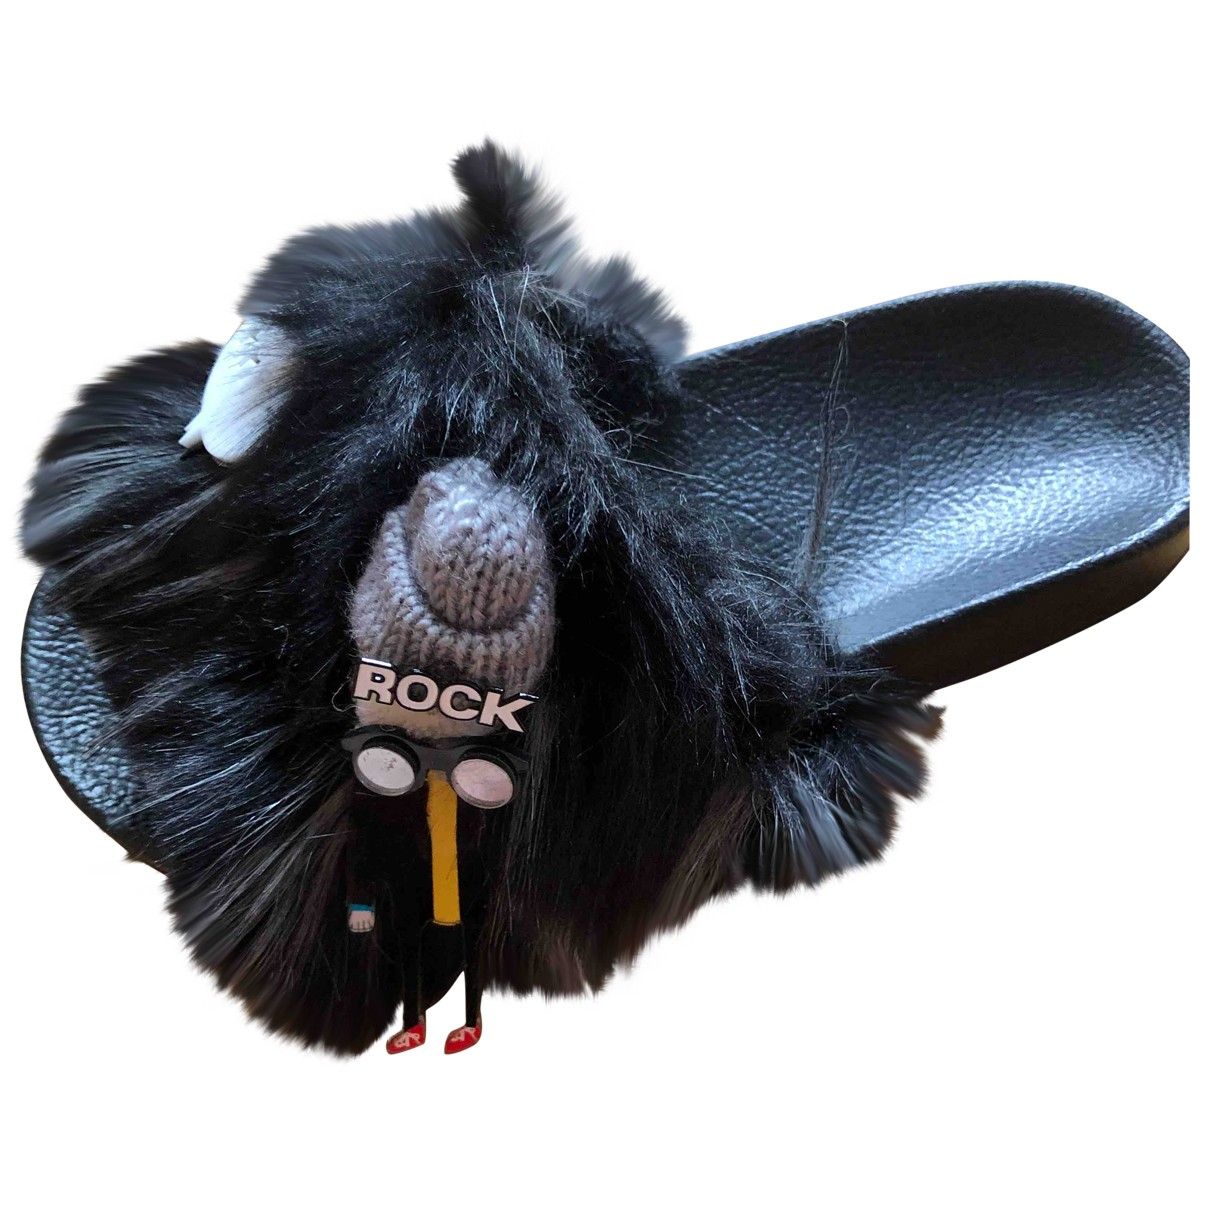 Steve Madden \N Black Rubber Mules & Clogs for Women 38 EU